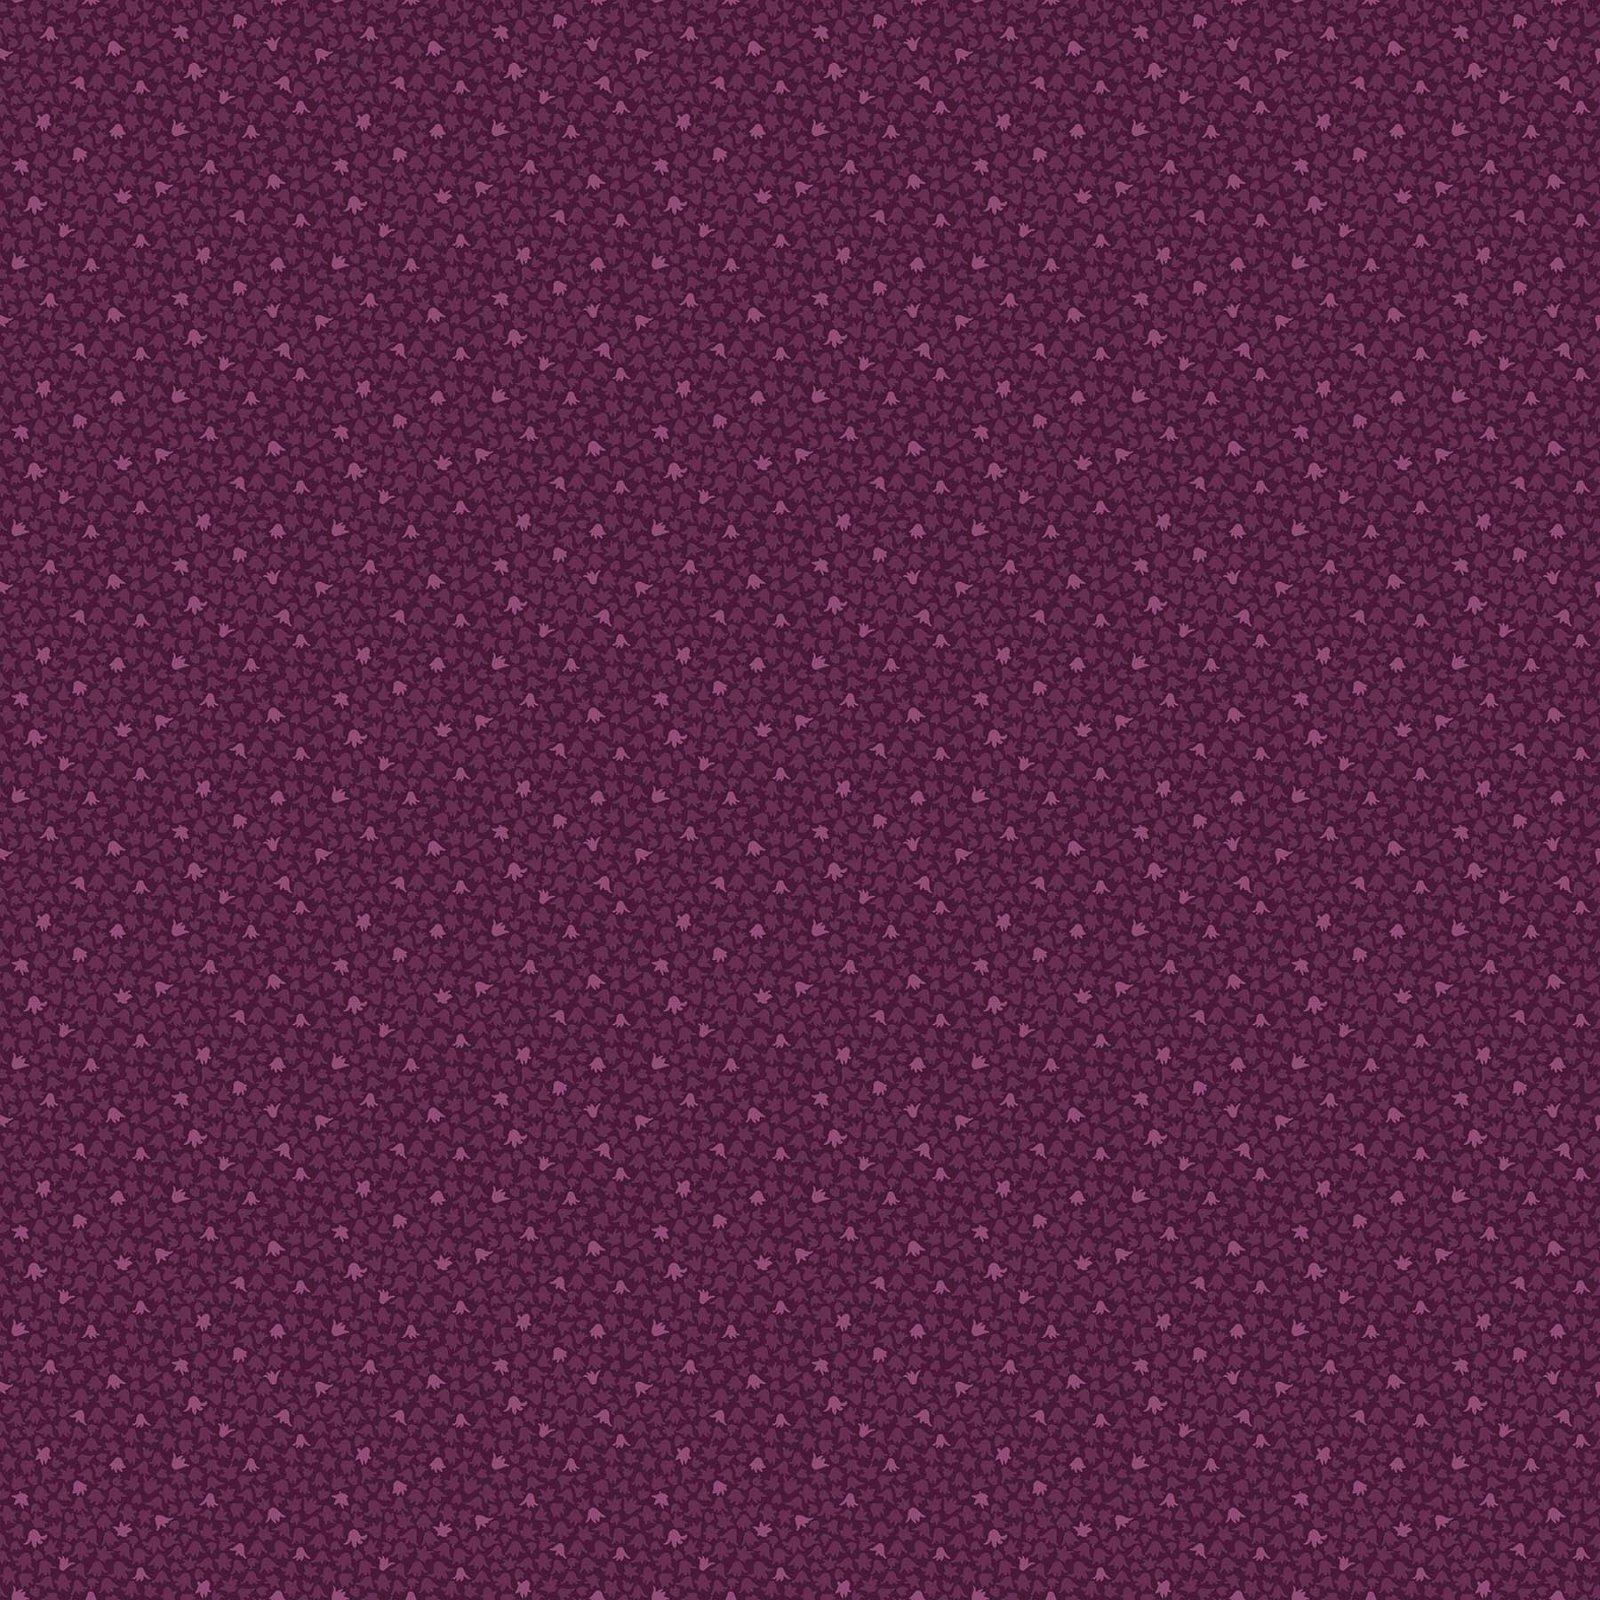 FIGO Fabrics Mountain Meadow BELL FLOWER (purple) by Pippa Shaw